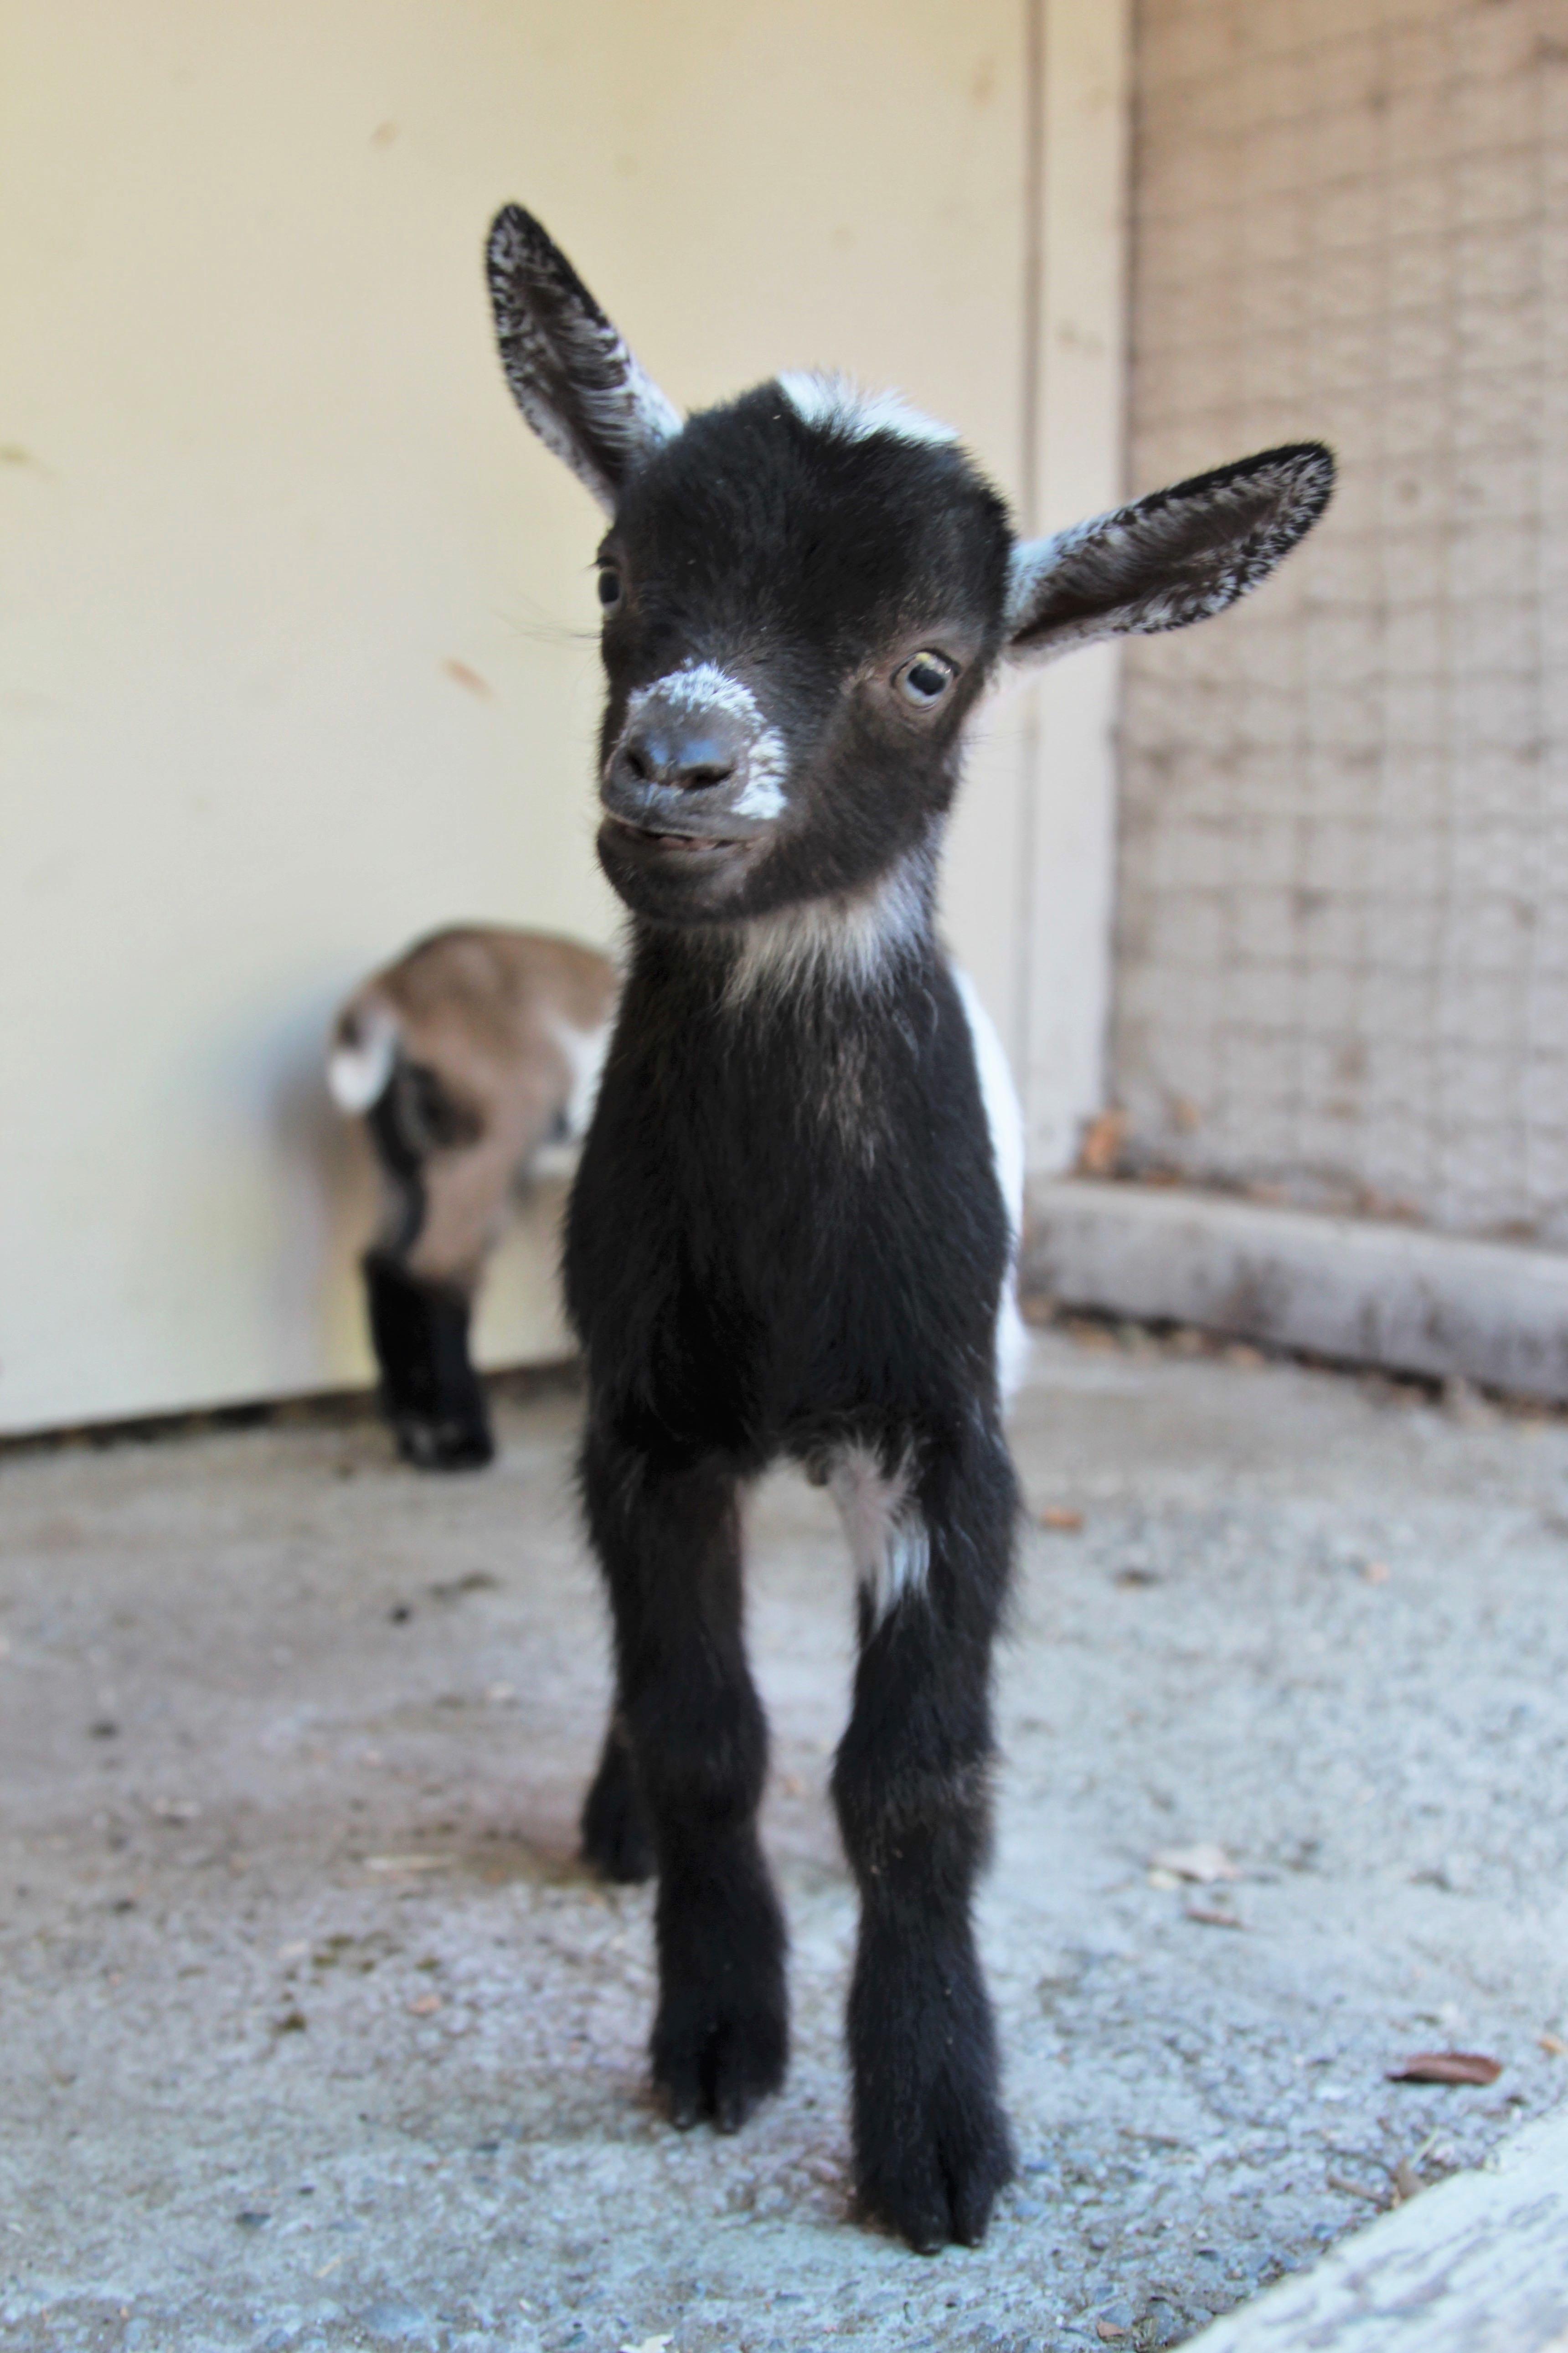 Bucky the Goat